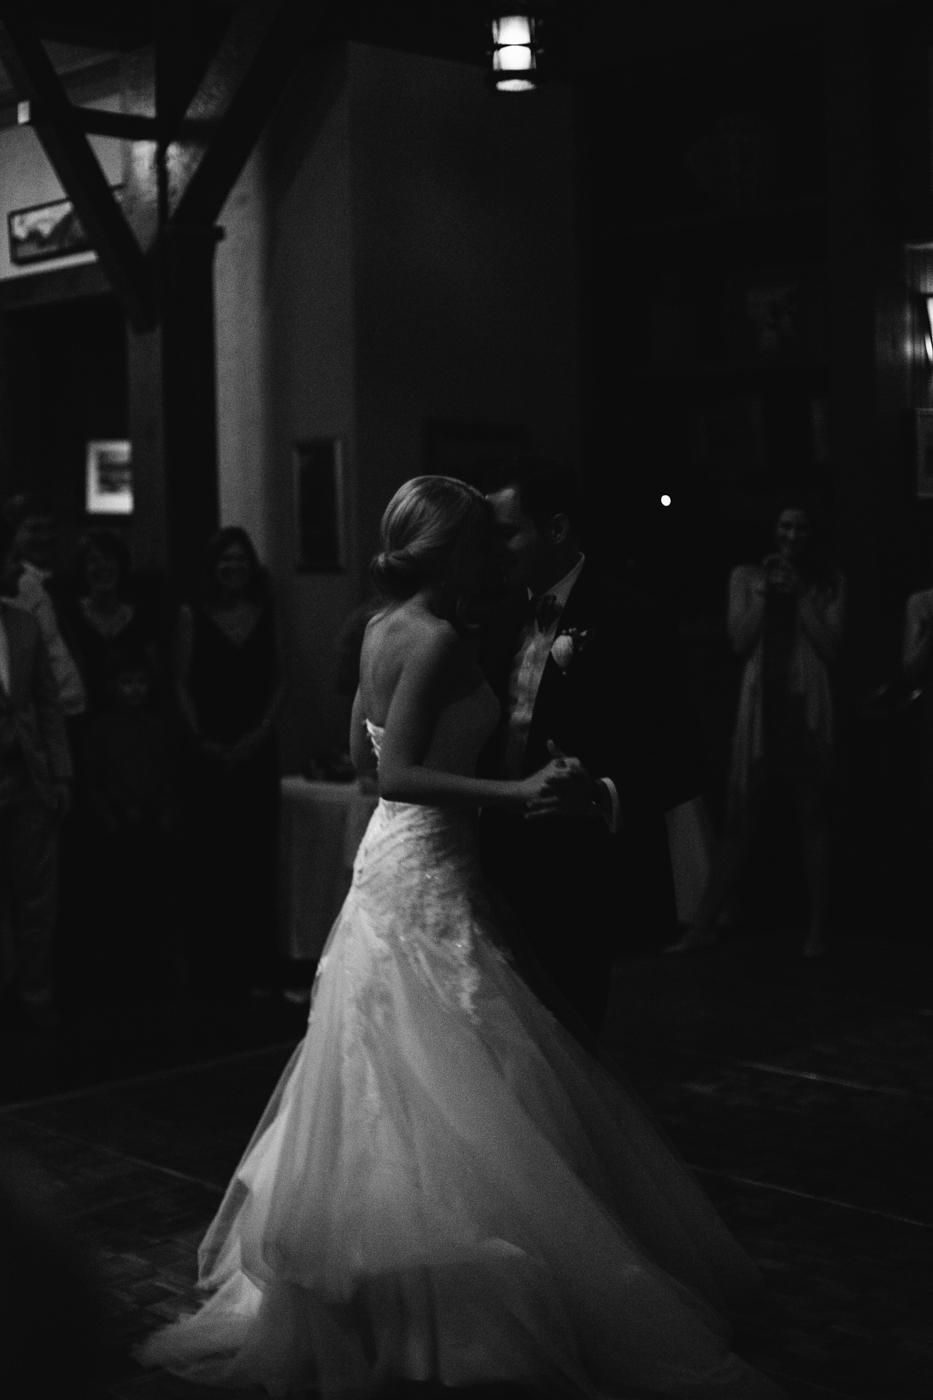 aspen-wedding-photographer-23.jpg